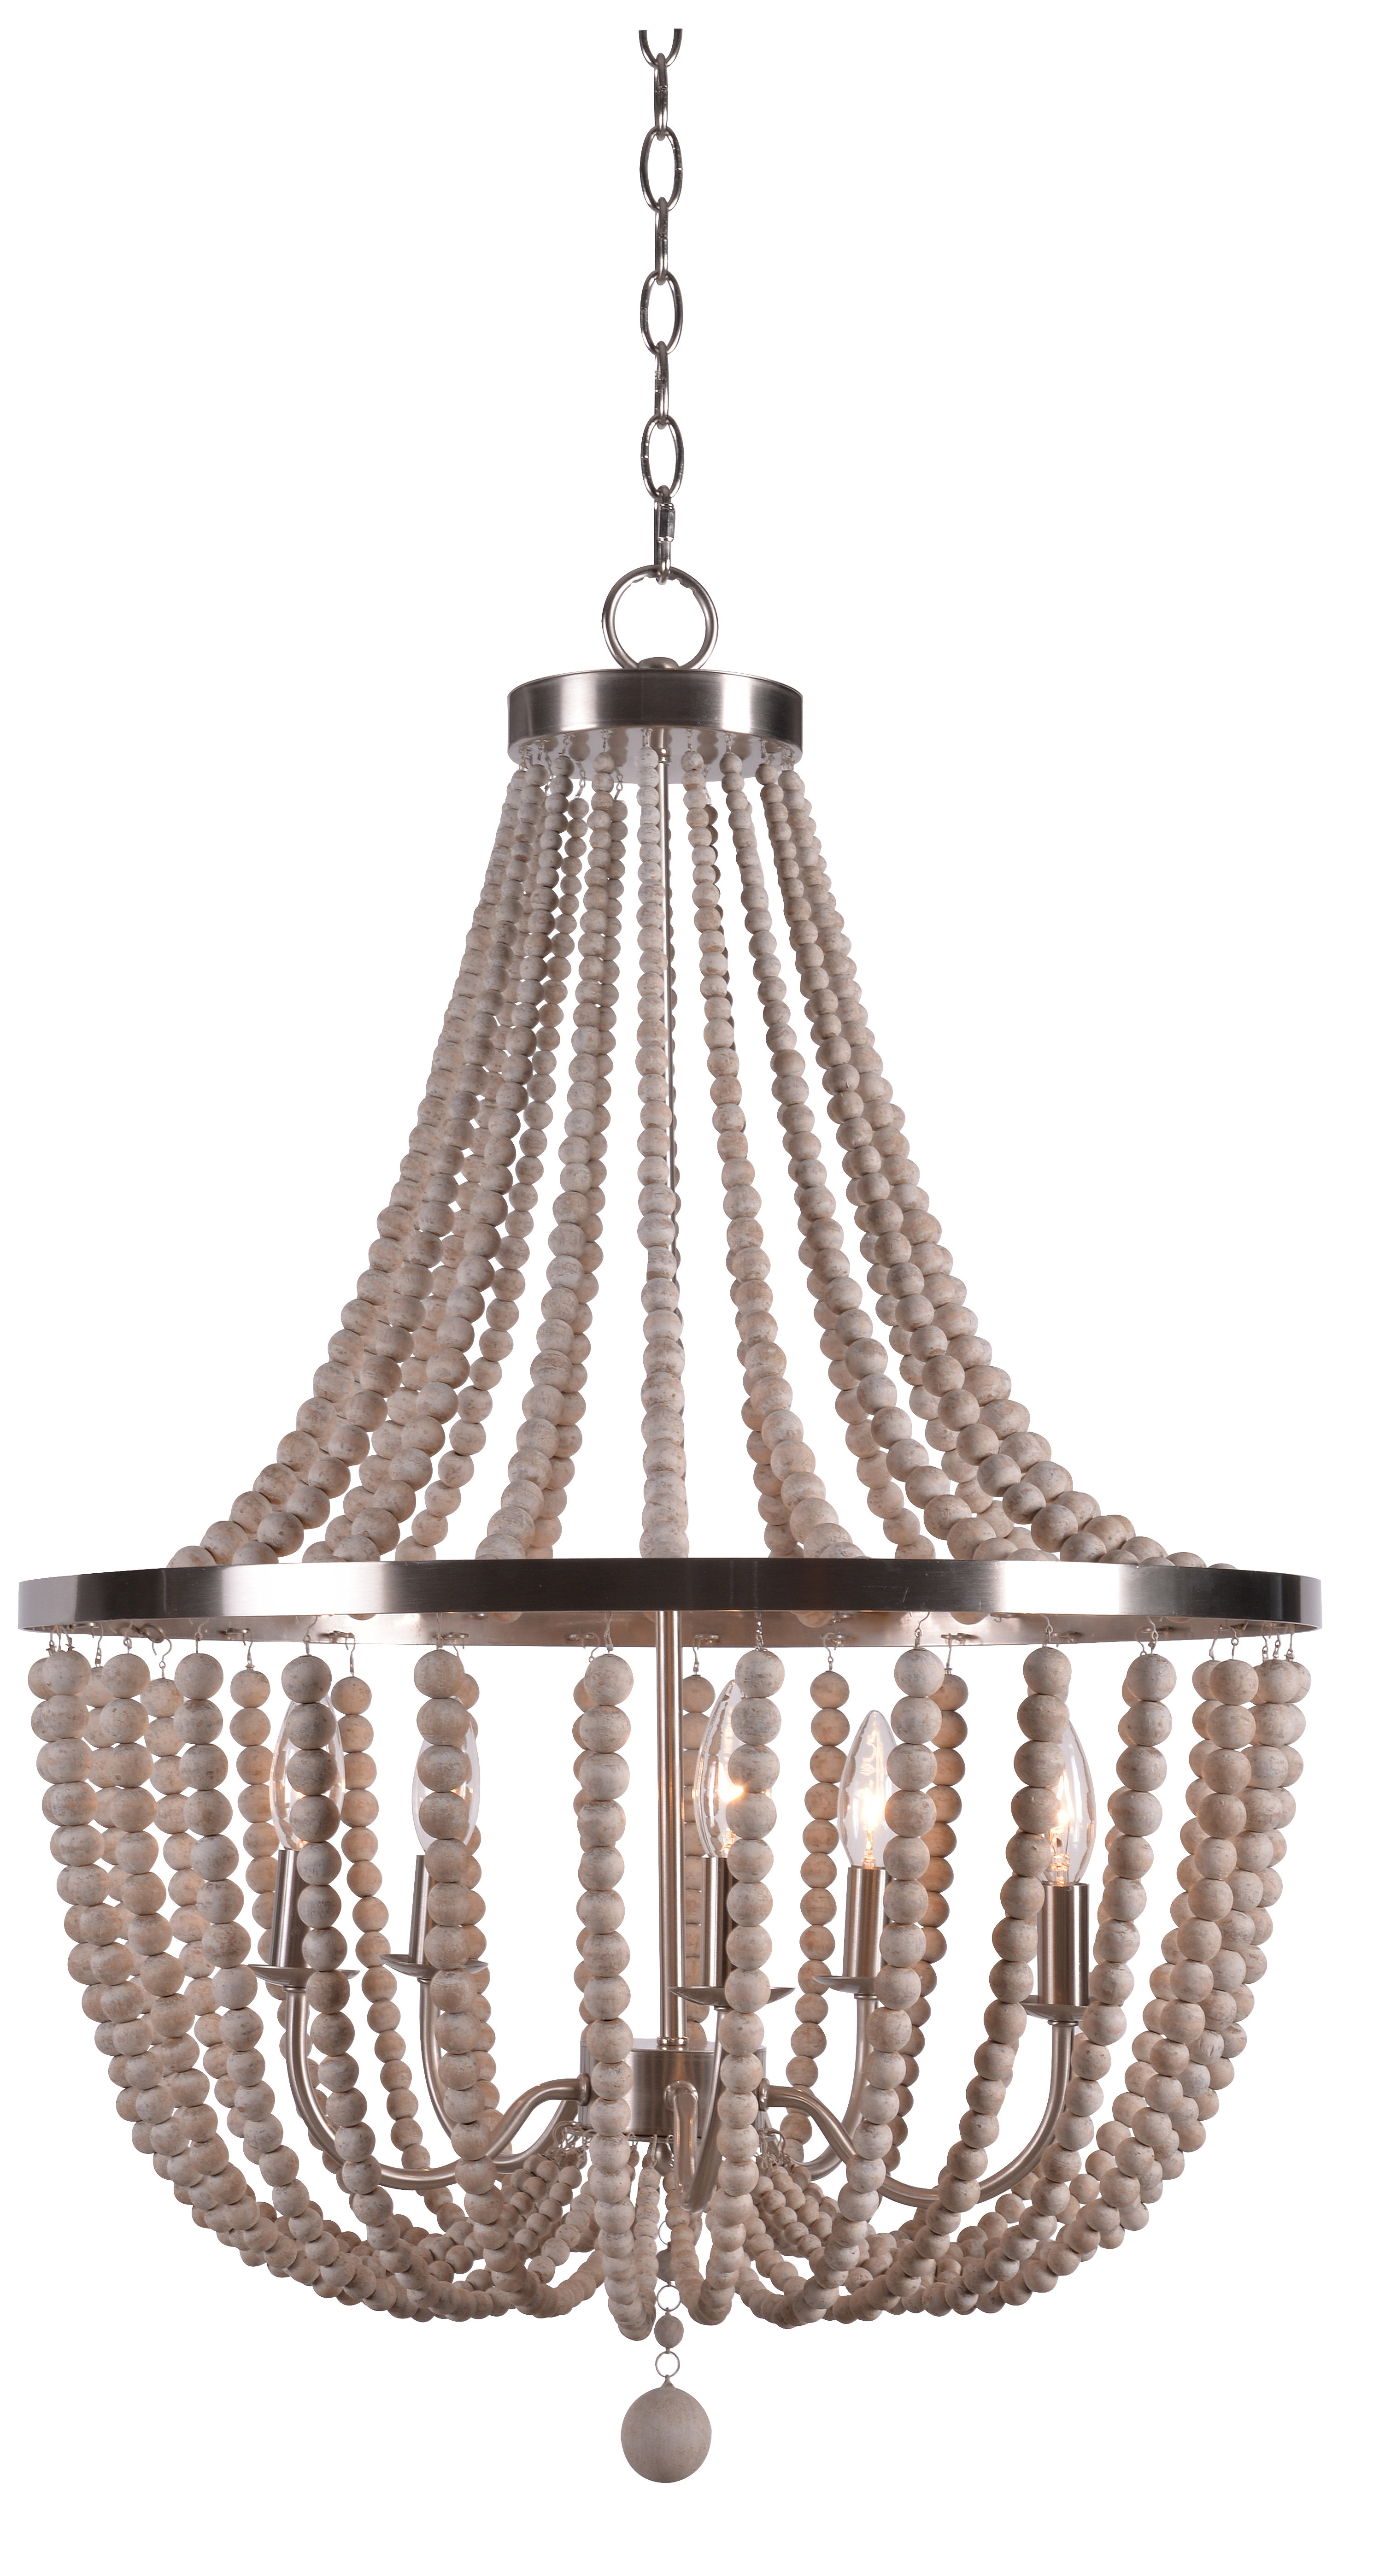 Most Popular Tilden Wood Bead 5 Light Empire Chandelier With Duron 5 Light Empire Chandeliers (View 12 of 20)